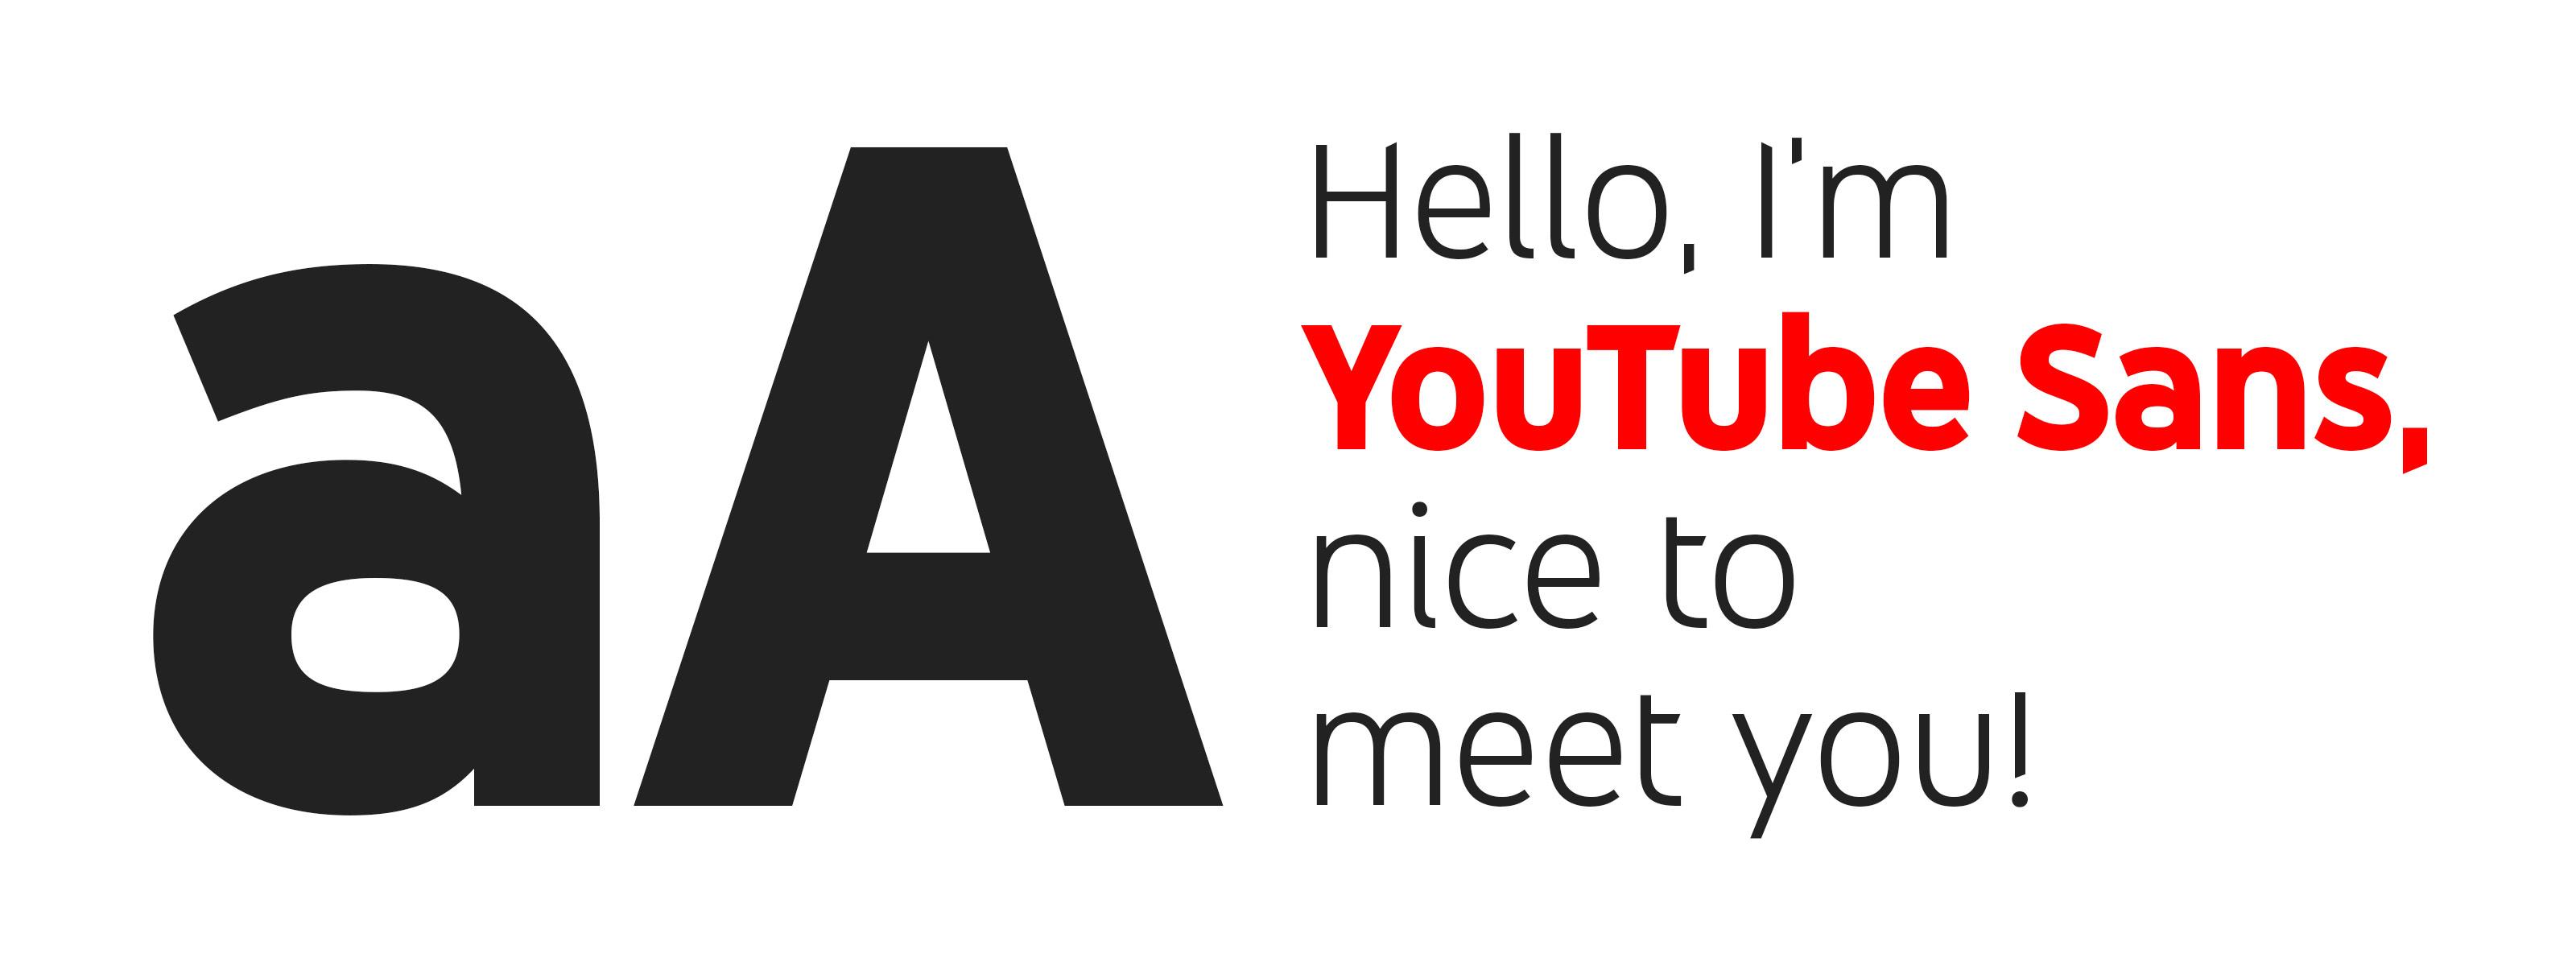 Youtube Sans typography TV Saffron - we need cafeine-05